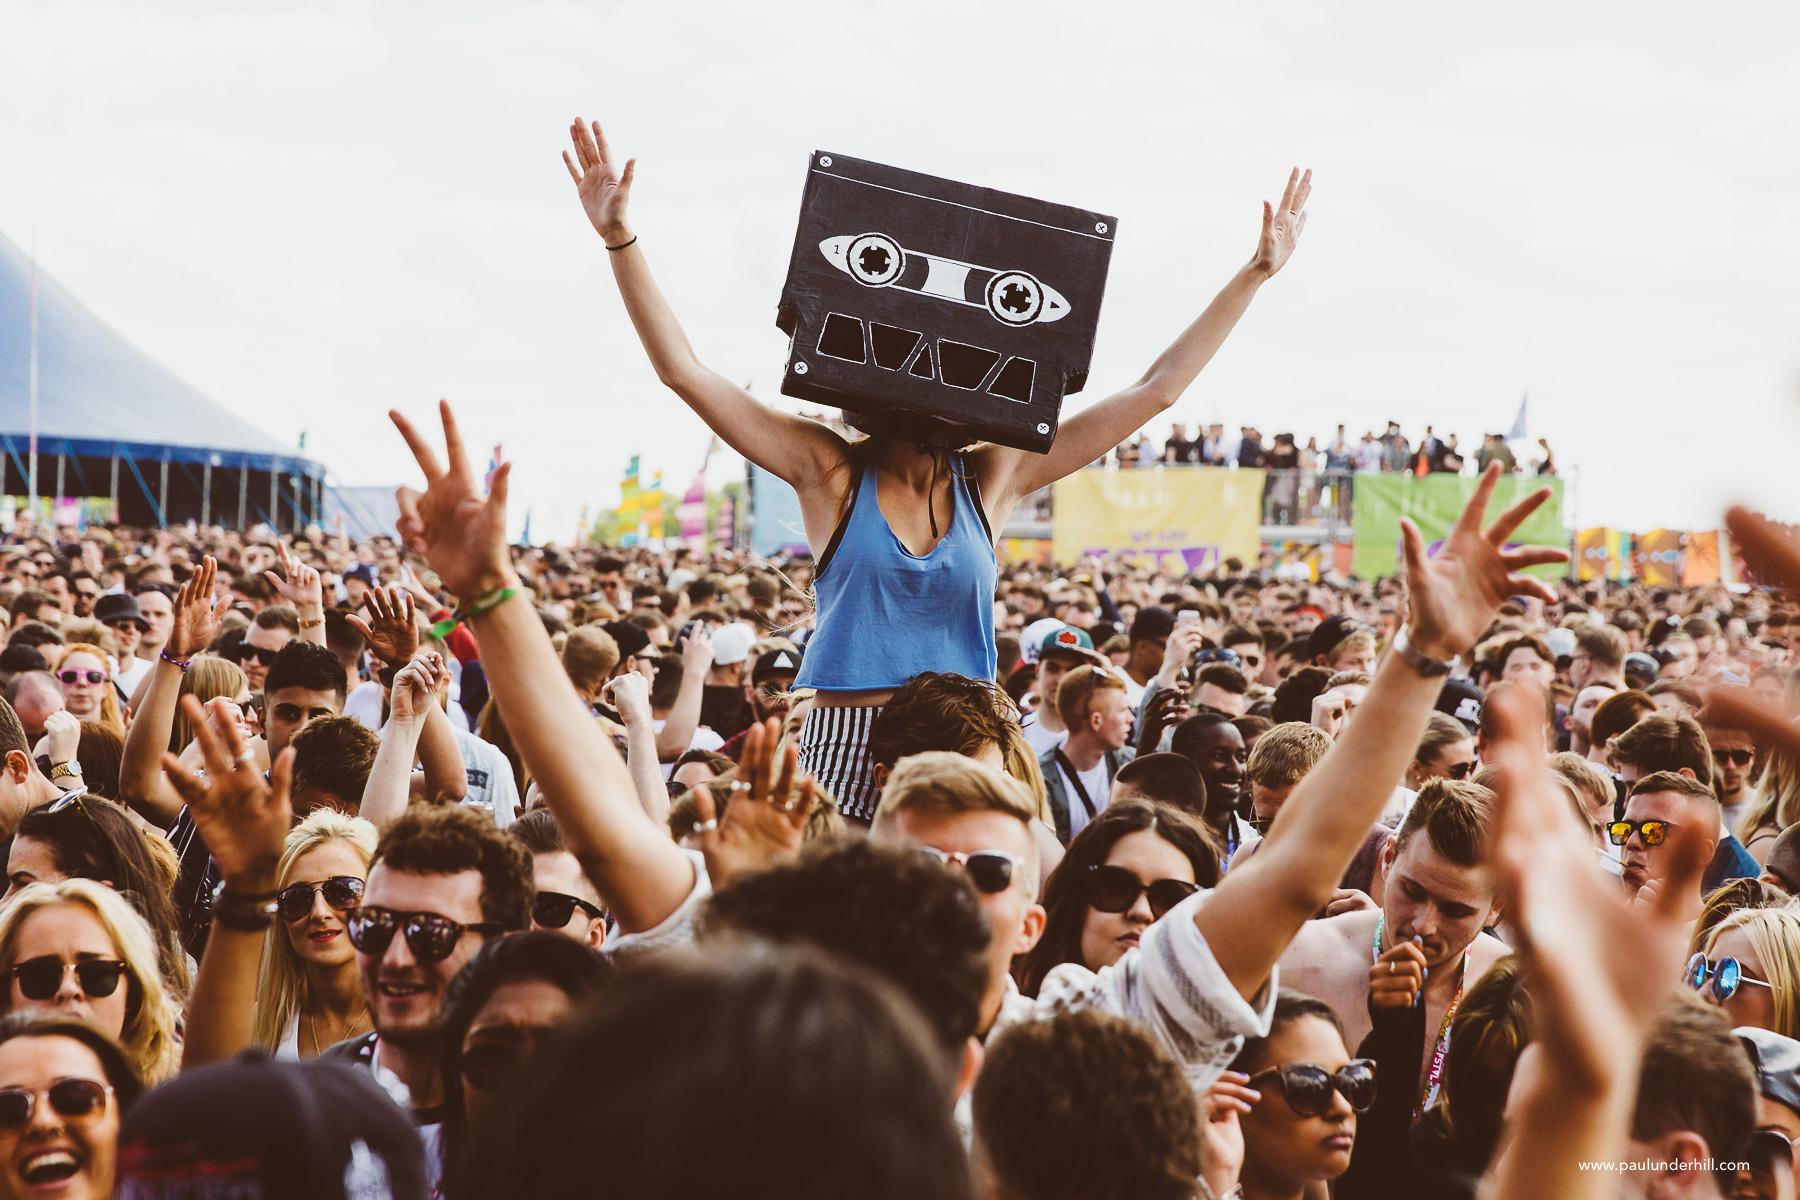 Festival-photography-00012